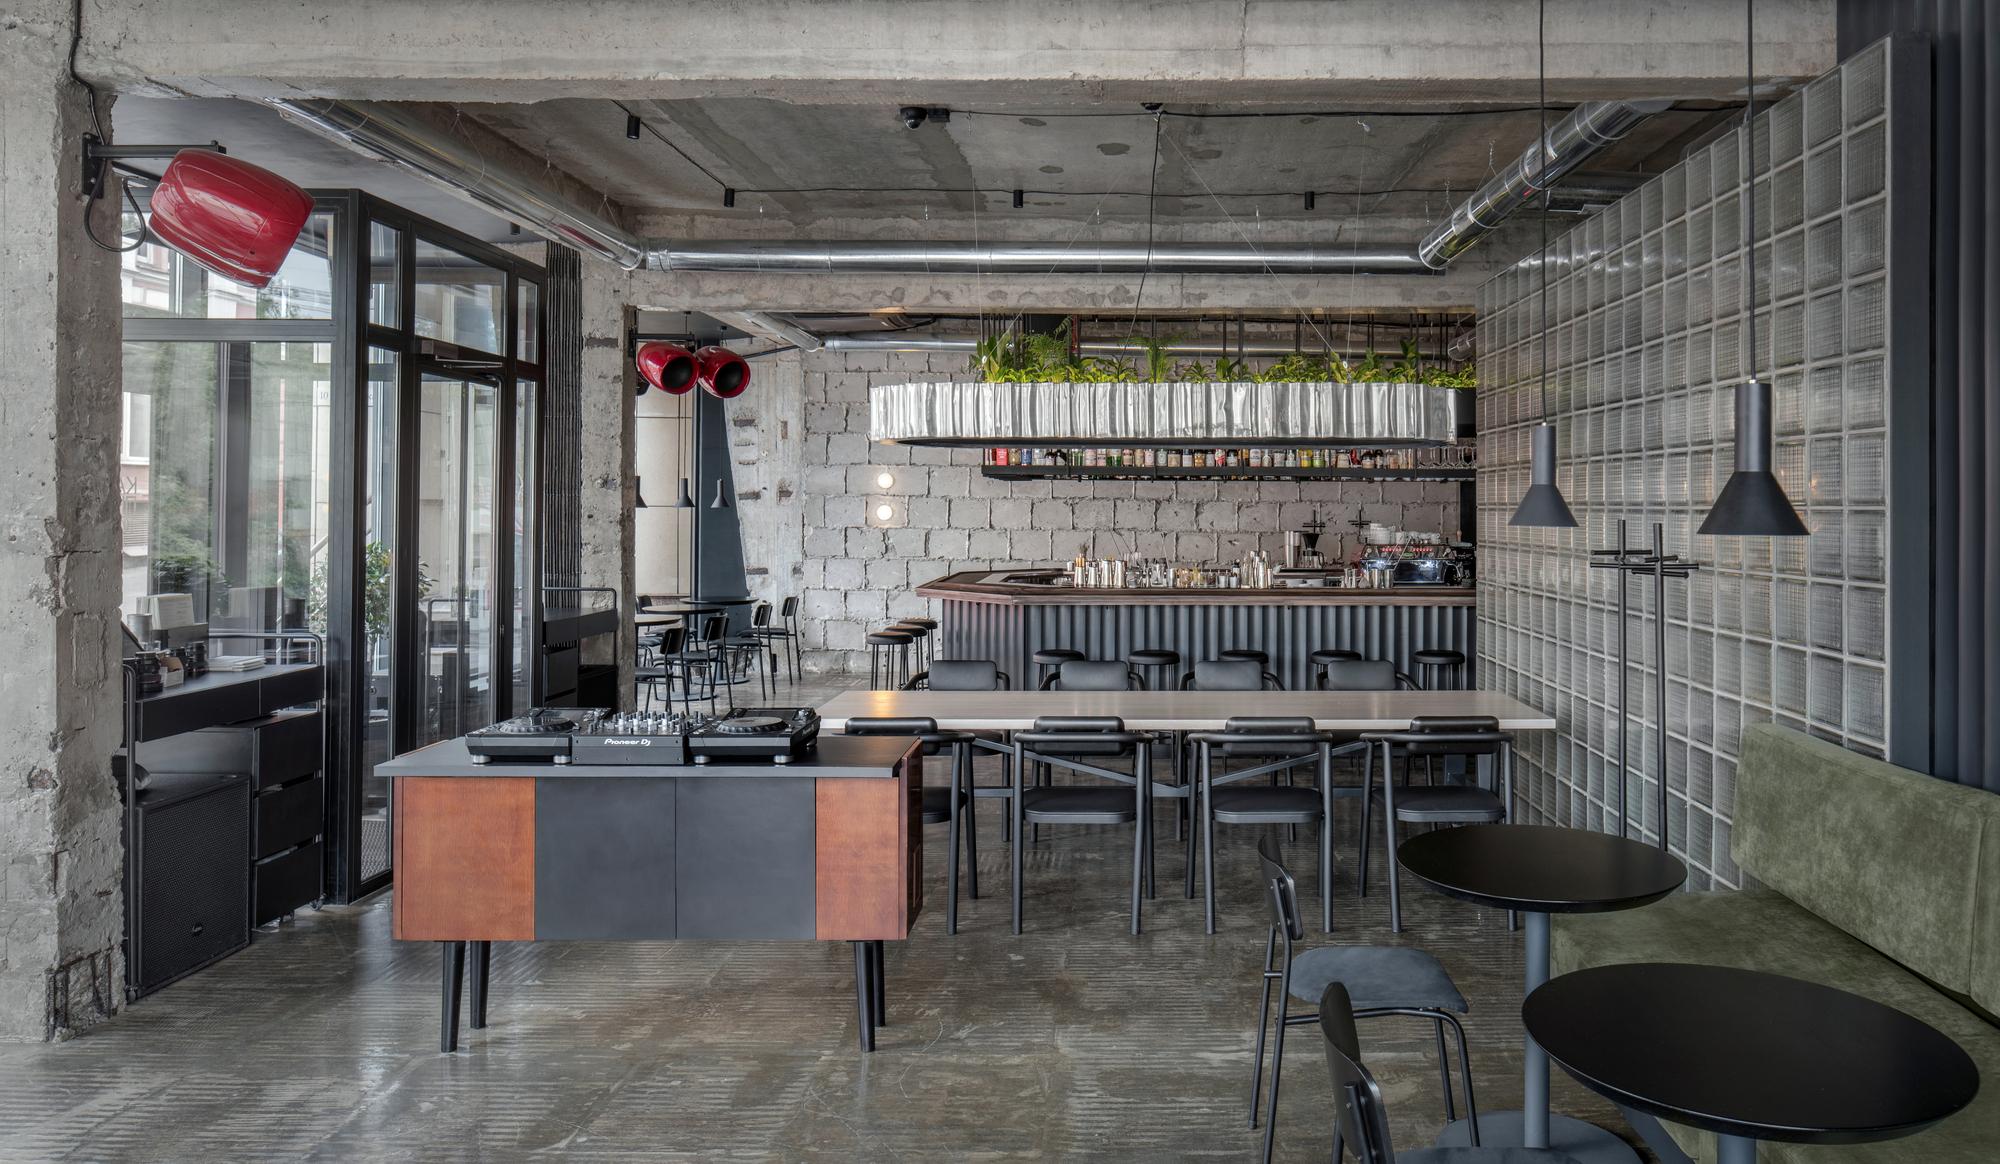 Protagonist Bar / balbek bureau